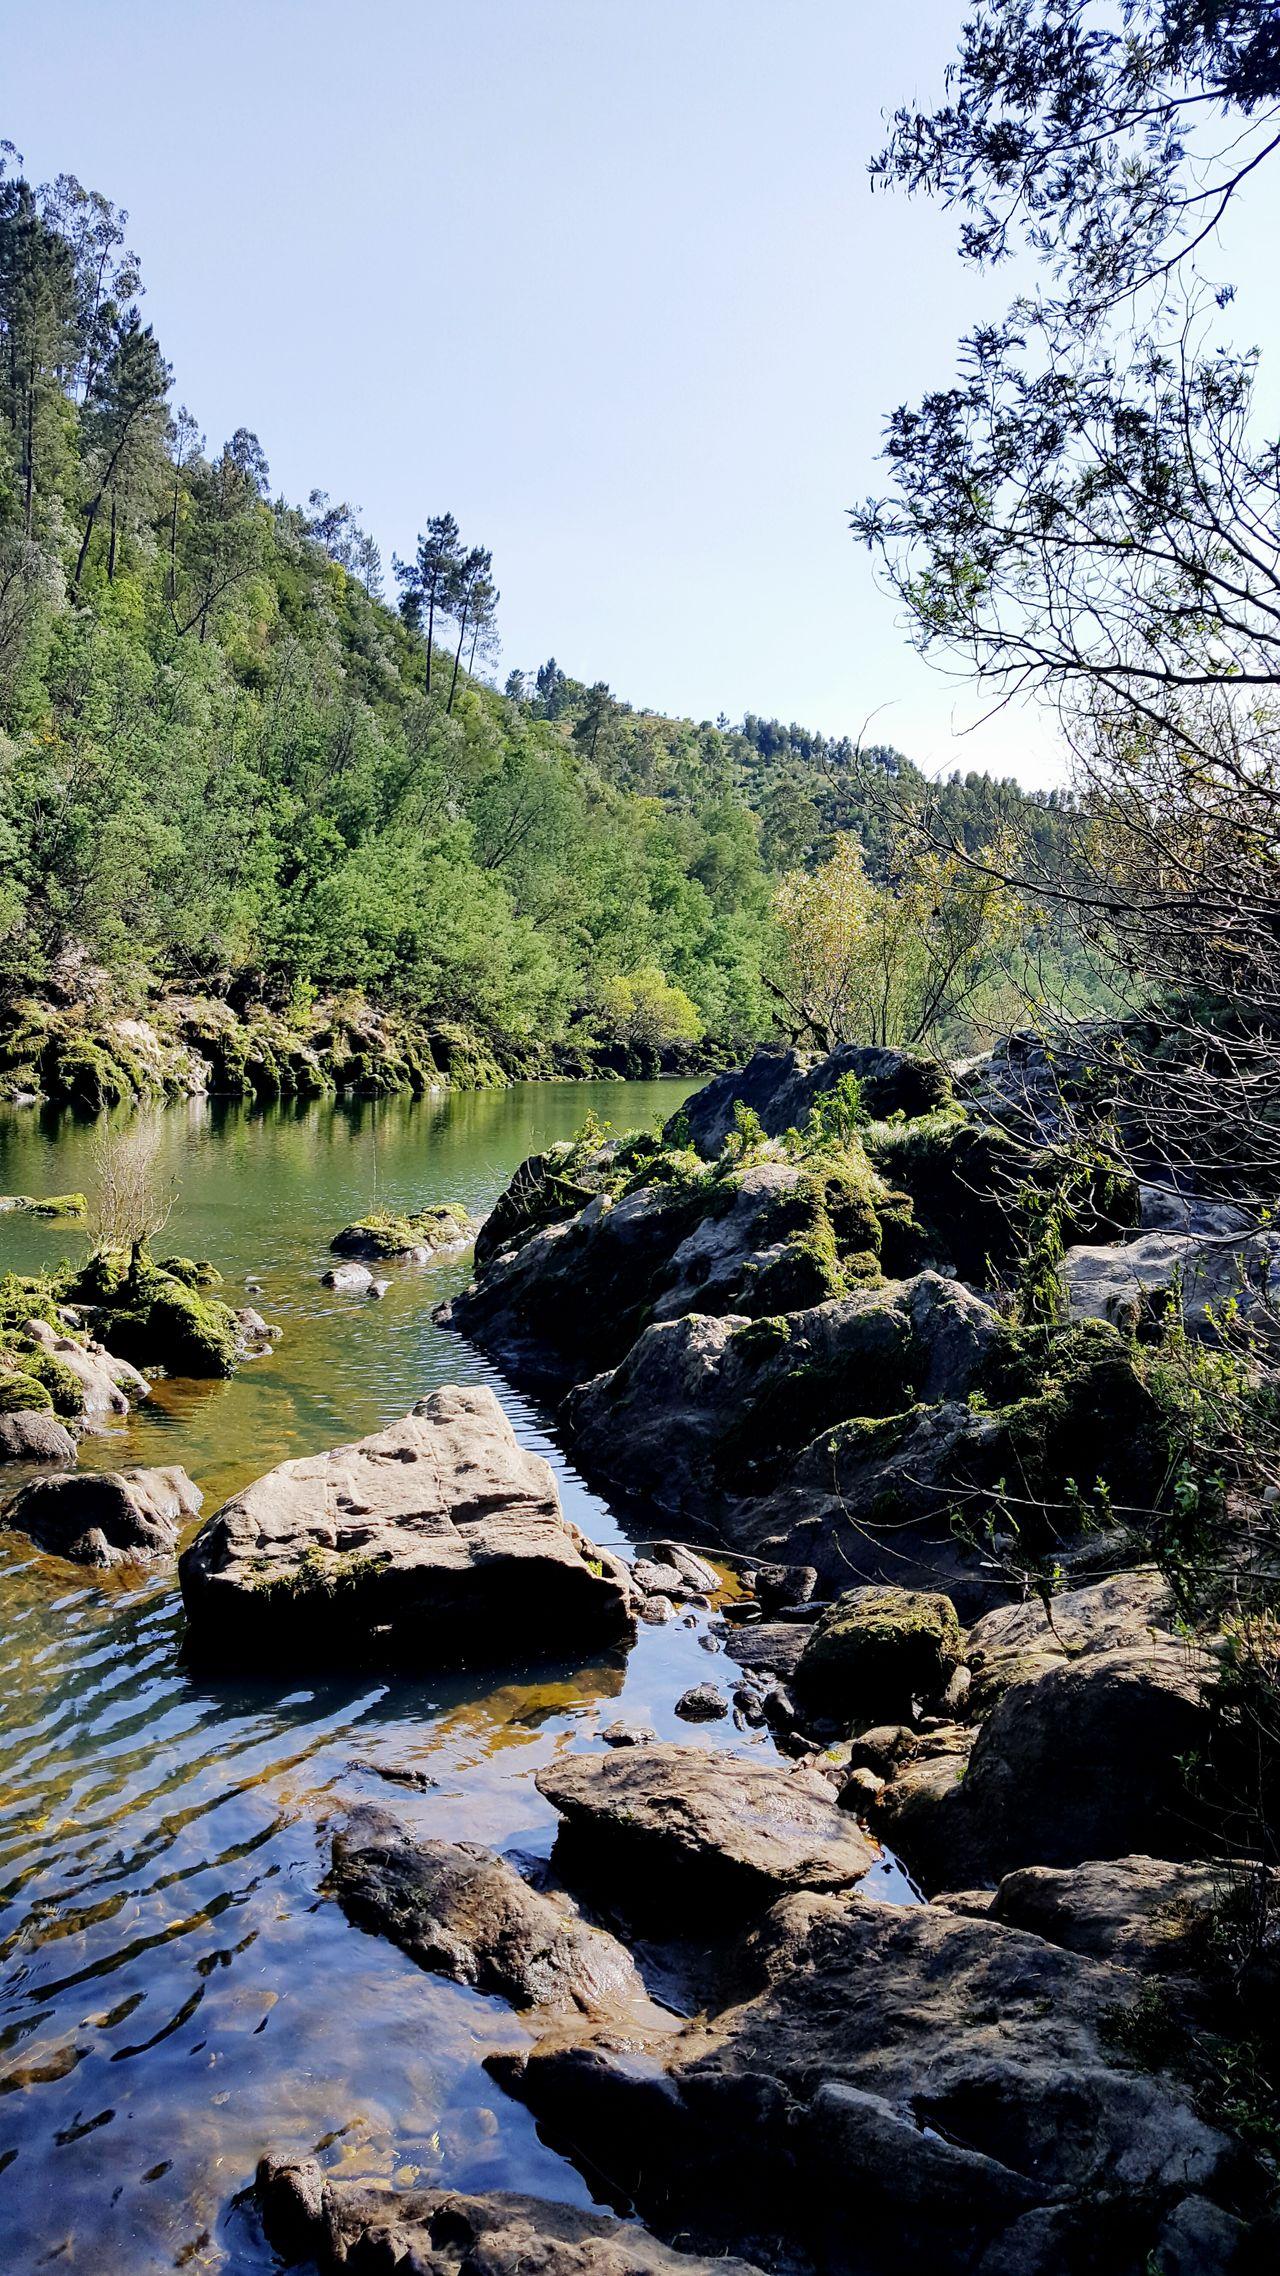 River Natureza 🐦🌳 Natureza🍁 Barragemcastelodobode Barragensdeportugal Water Rio Barragem